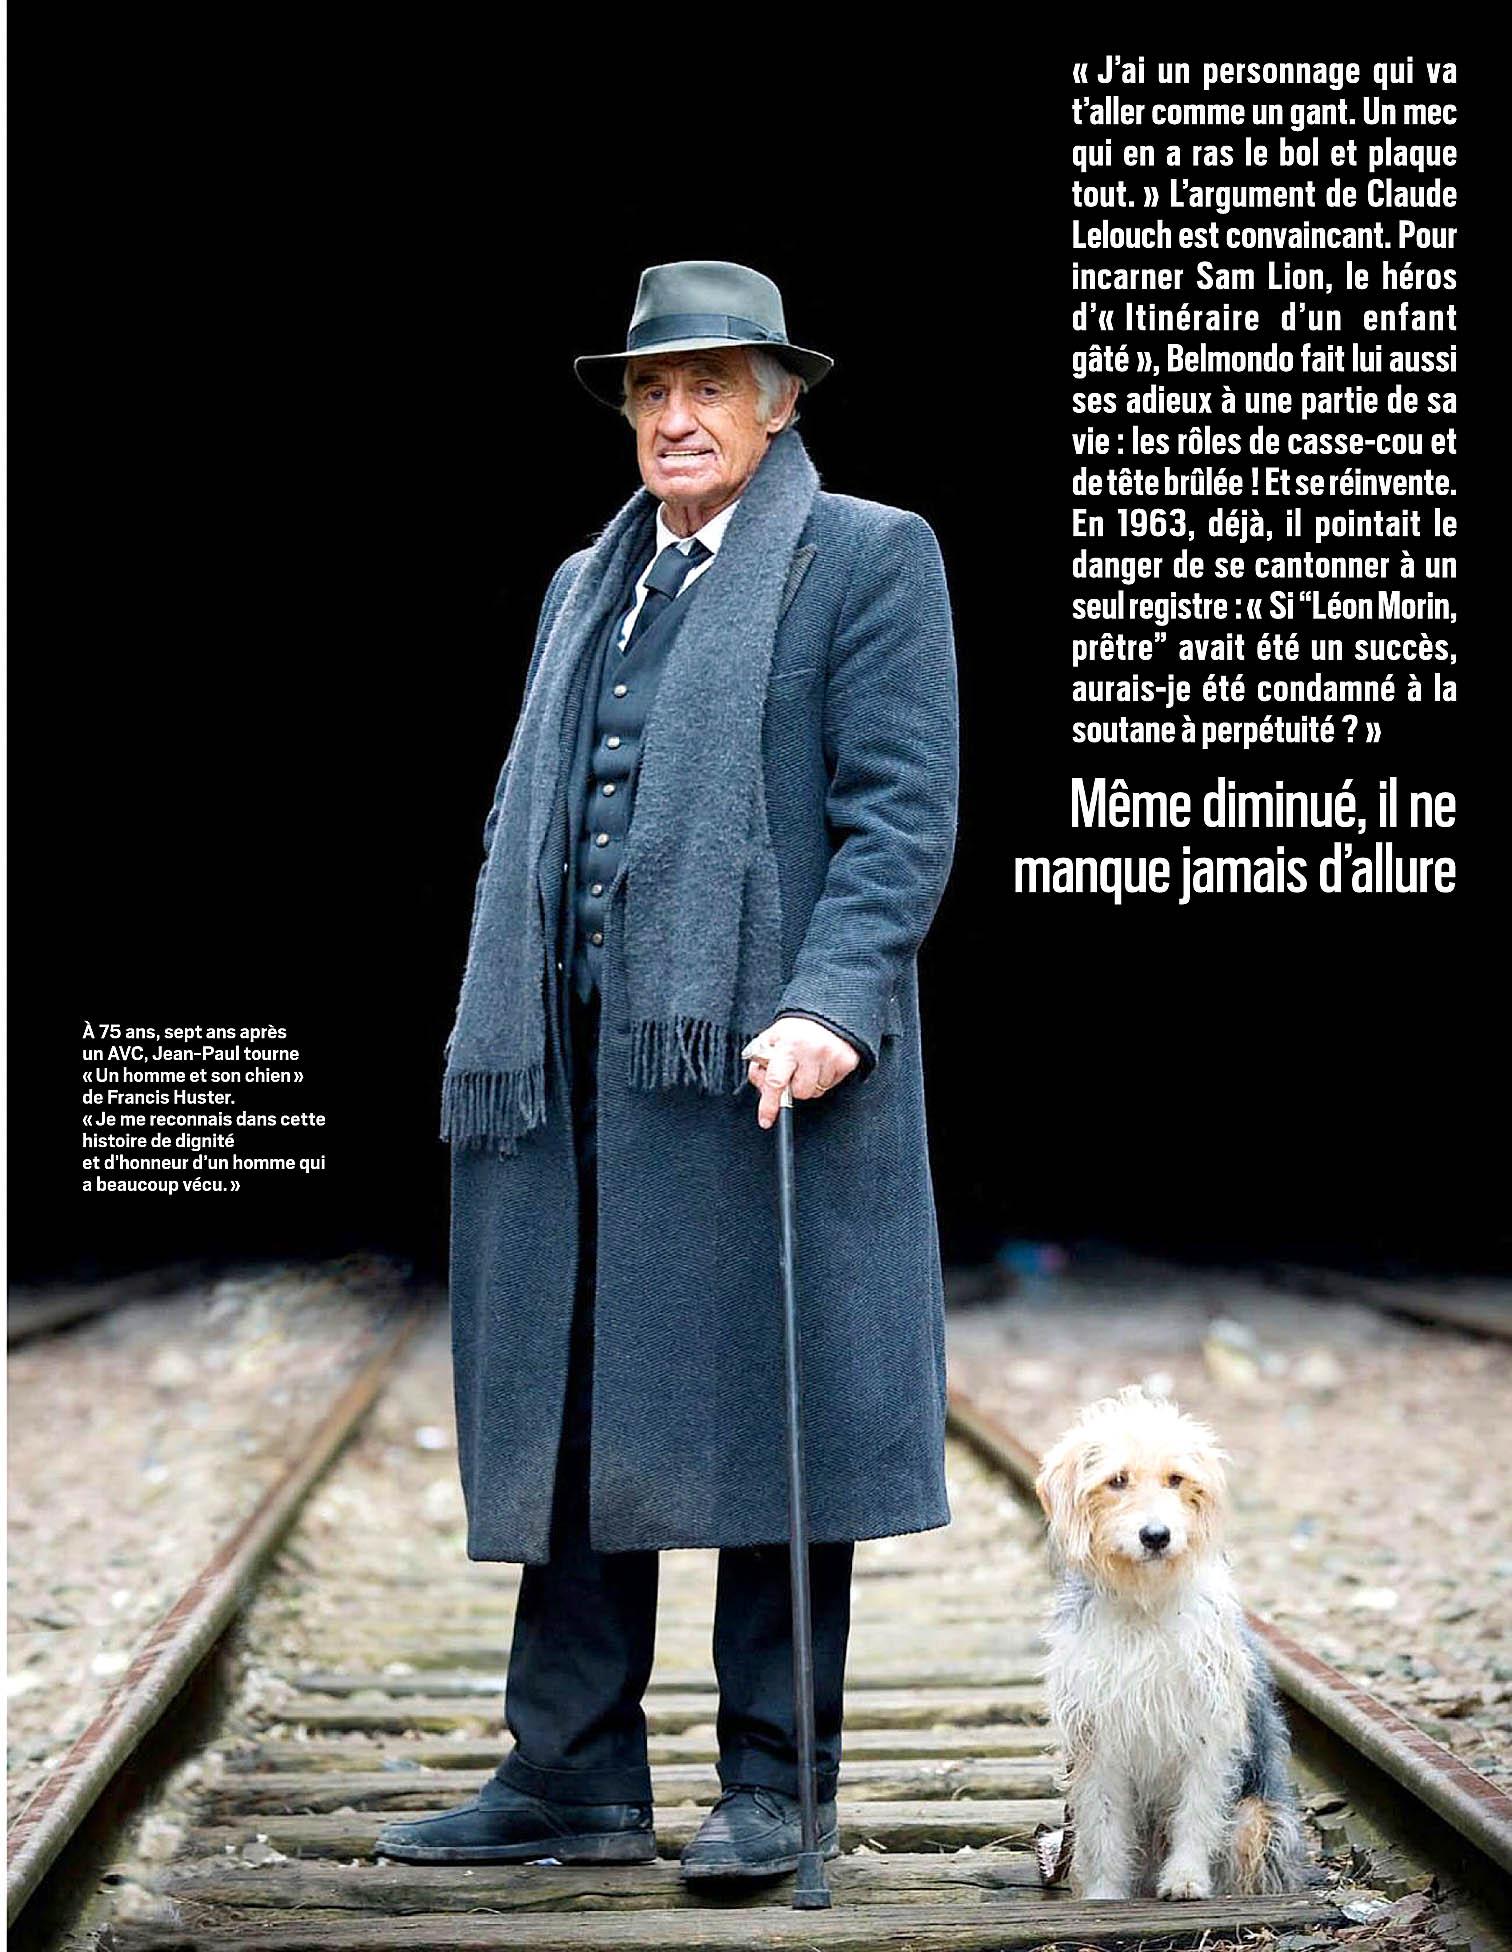 Paris Match 210909 Belmondo 27.jpg